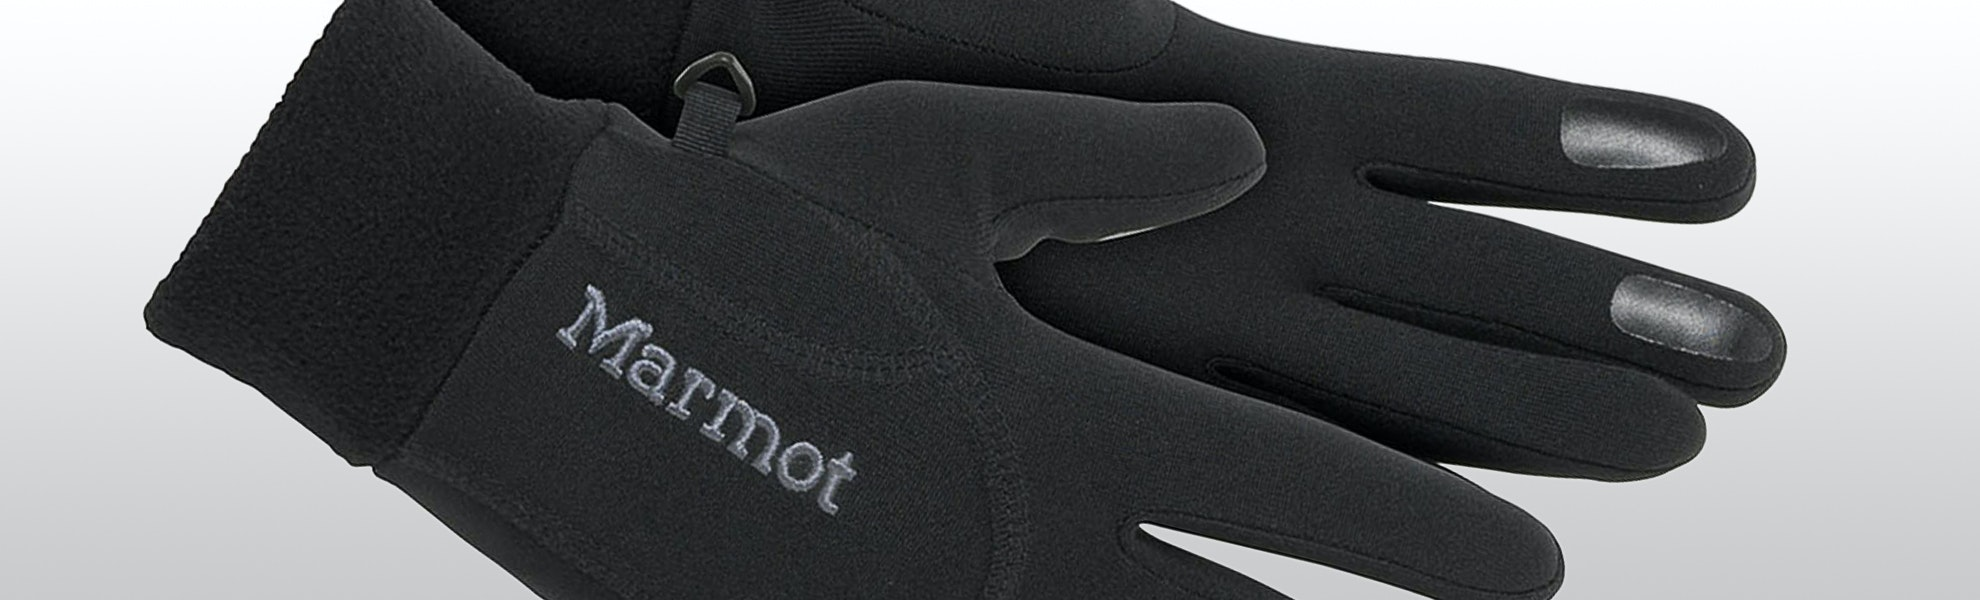 Marmot Power Stretch Gloves